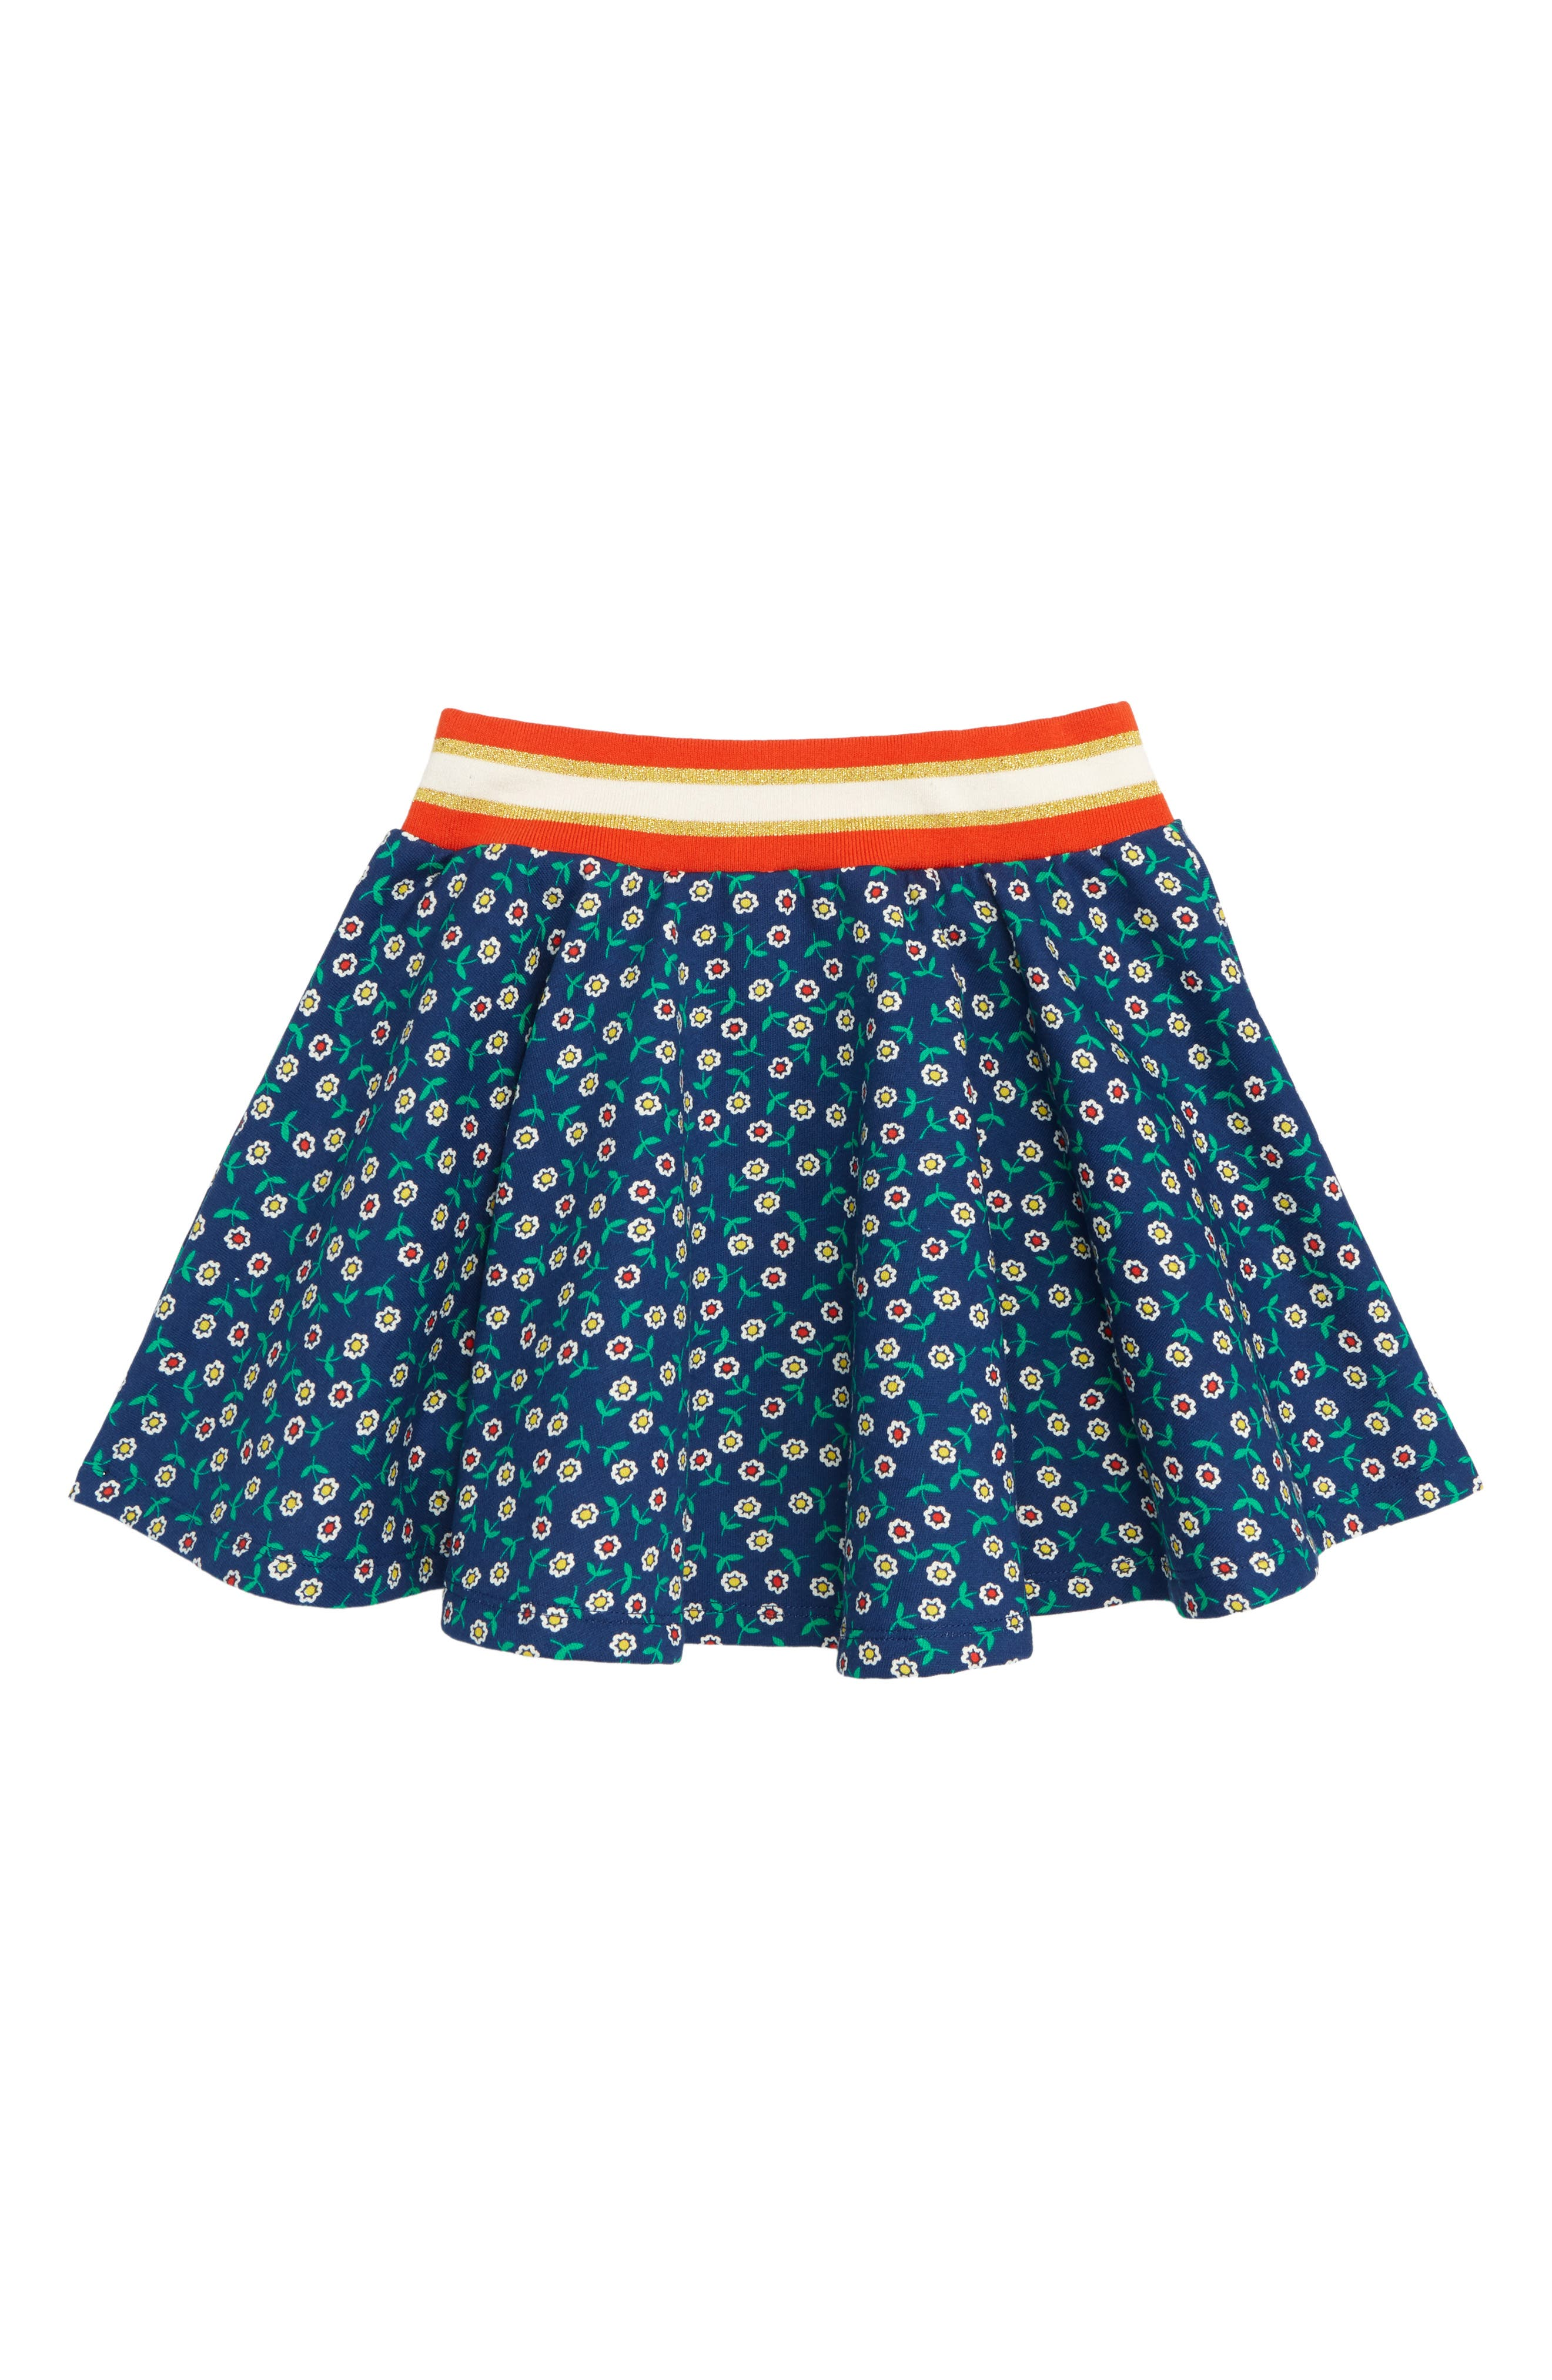 Colorful Skater Skirt,                             Main thumbnail 1, color,                             404